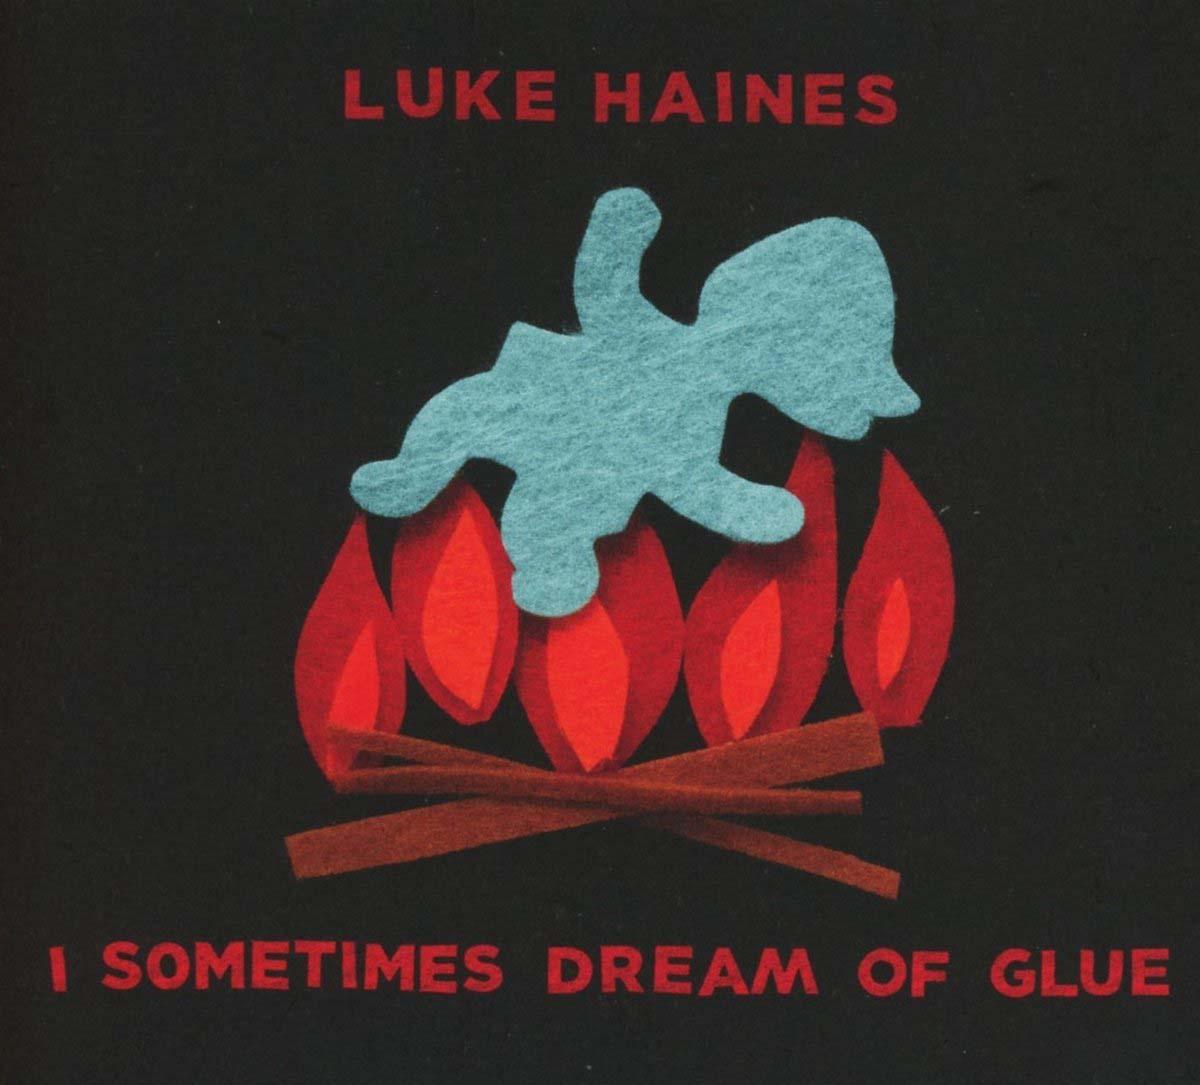 цена на Luke Haines Luke Haines. I Sometimes Dream Of Glue